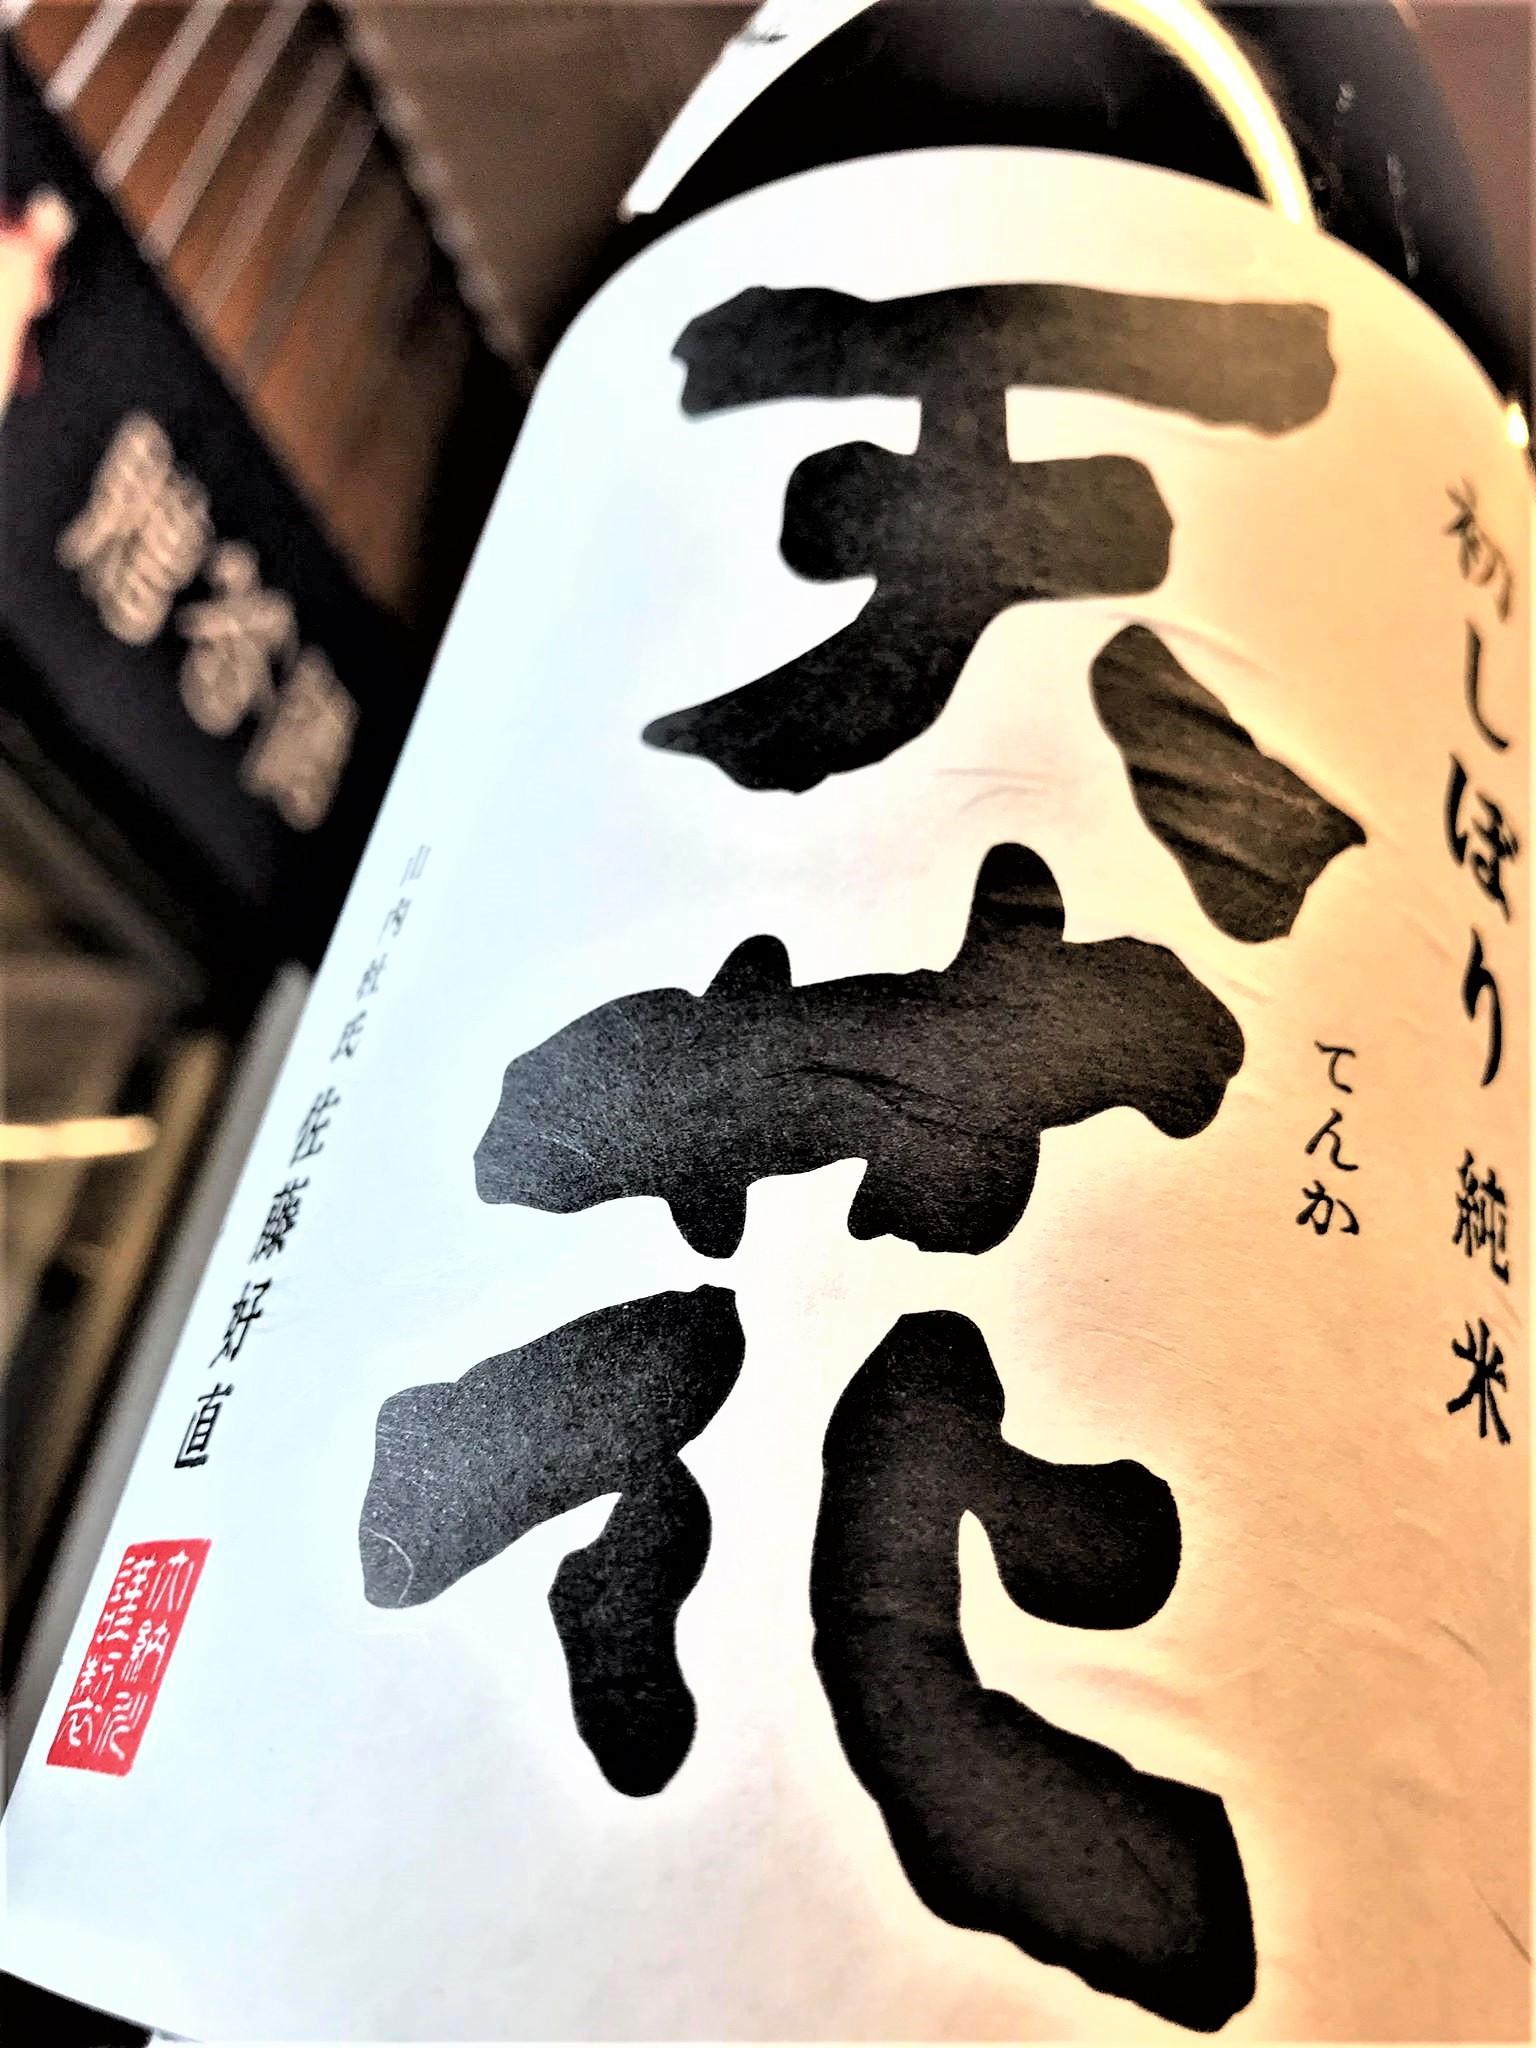 【日本酒】天花TENKA 初しぼり💧純米 無濾過生原酒 初回限定蔵出し 新酒令和1BY🆕_e0173738_1511265.jpg